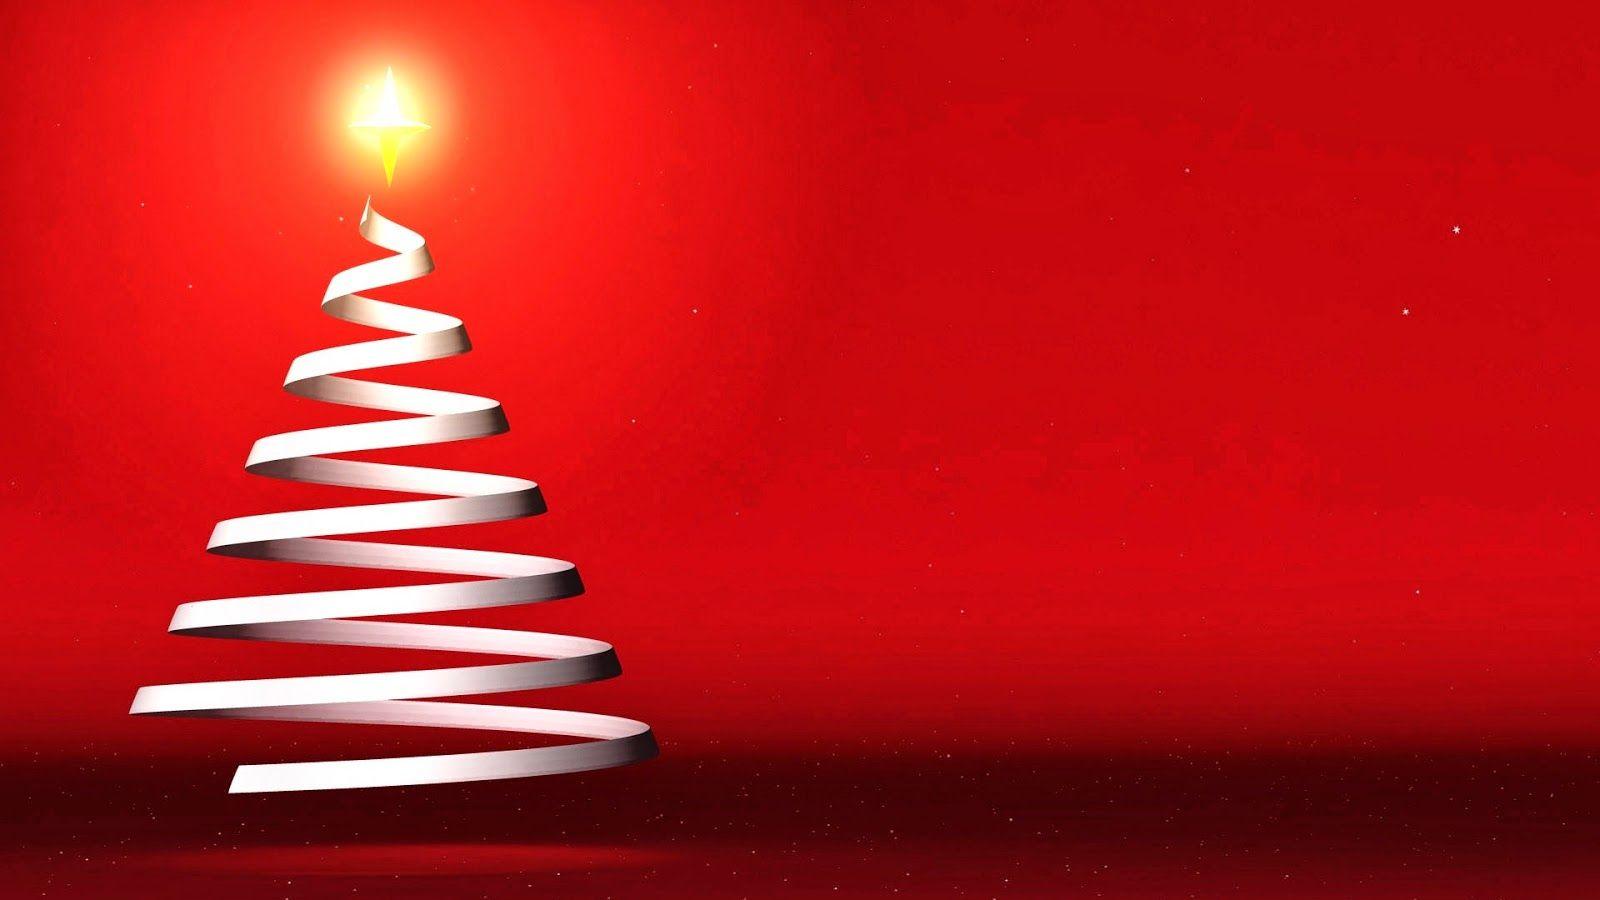 Fondos Verdes De Navidad Para Pantalla Hd 2 Hd Wallpapers: Fondos De Navidad Blanco Para Fondo En Hd Gratis 13 HD